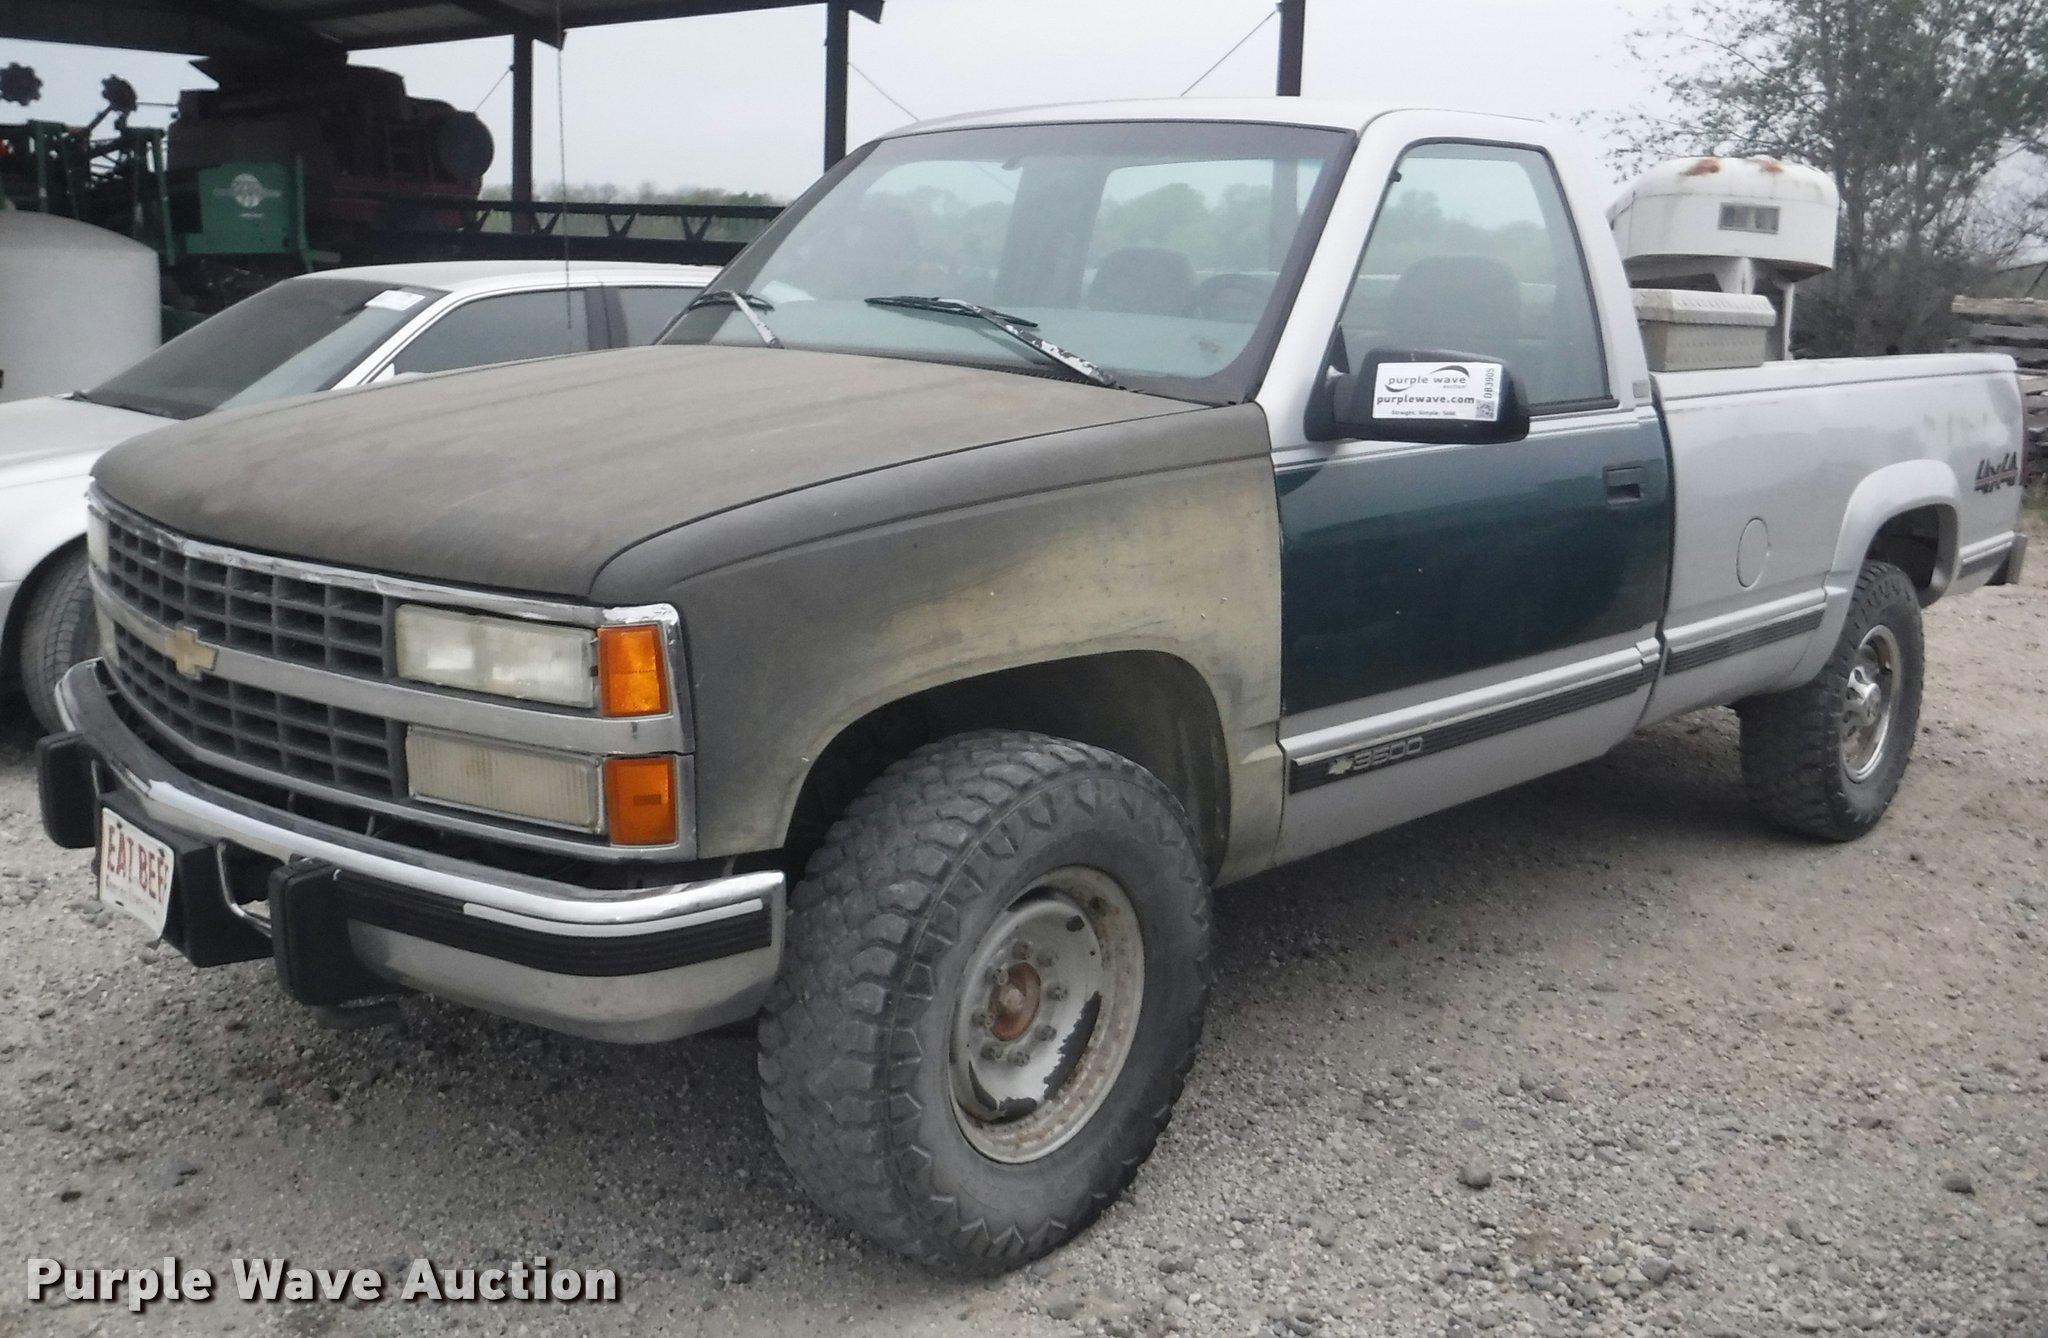 1992 chevrolet silverado 3500 pickup truck | item db3905 | s